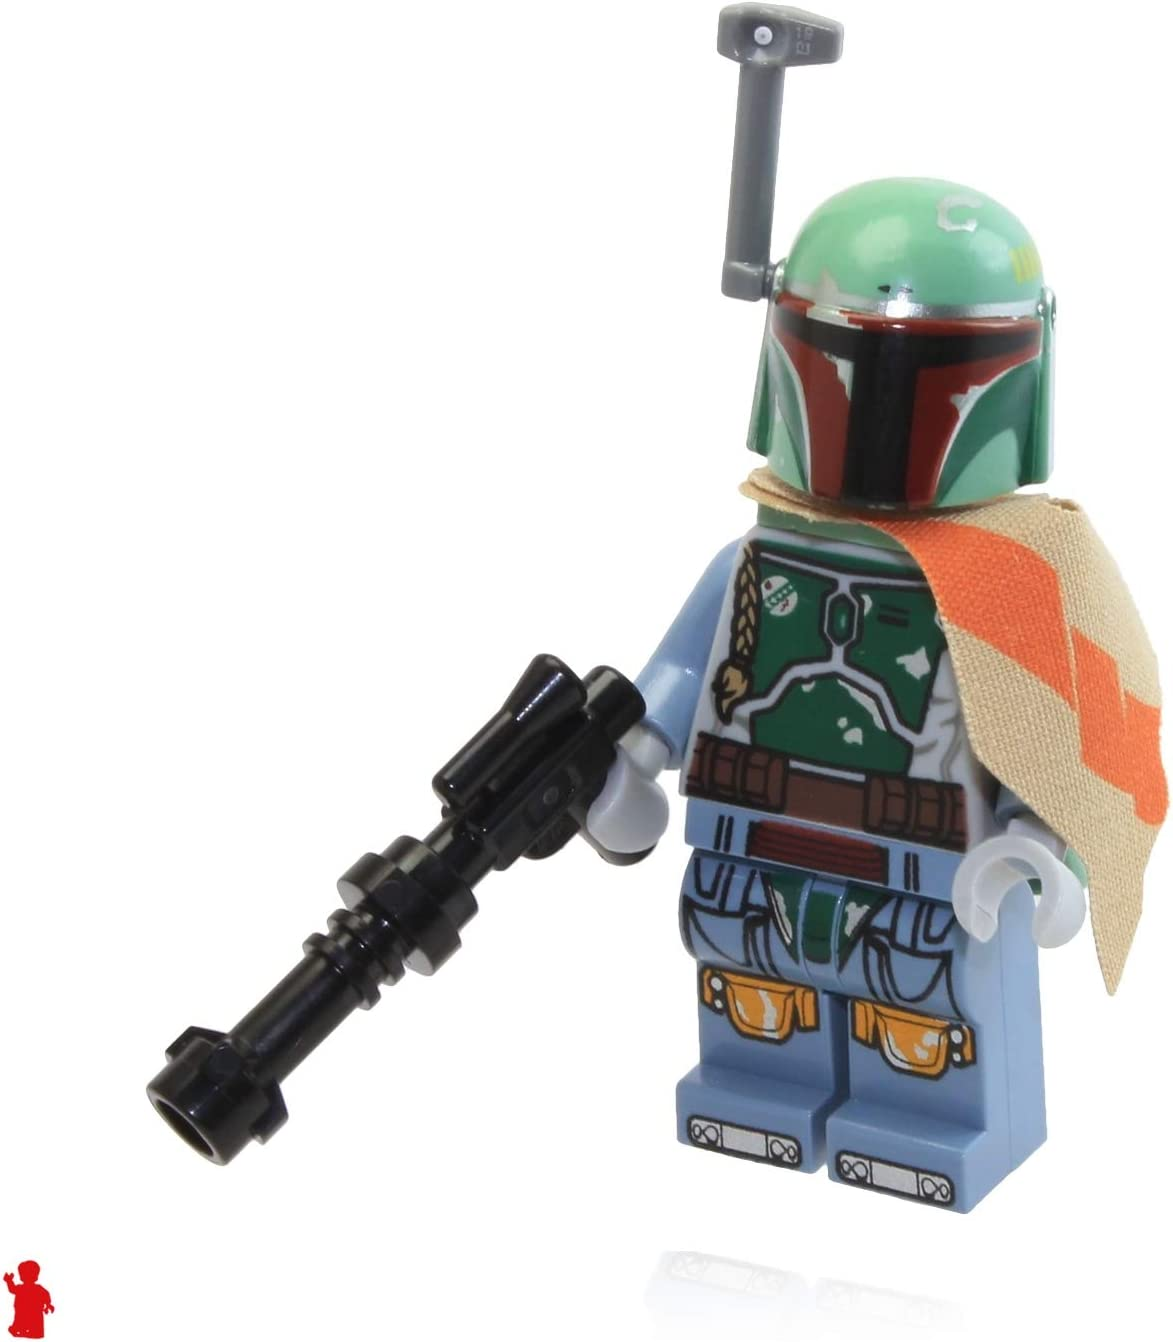 Lego star wars boba fett series  minifigure gun New